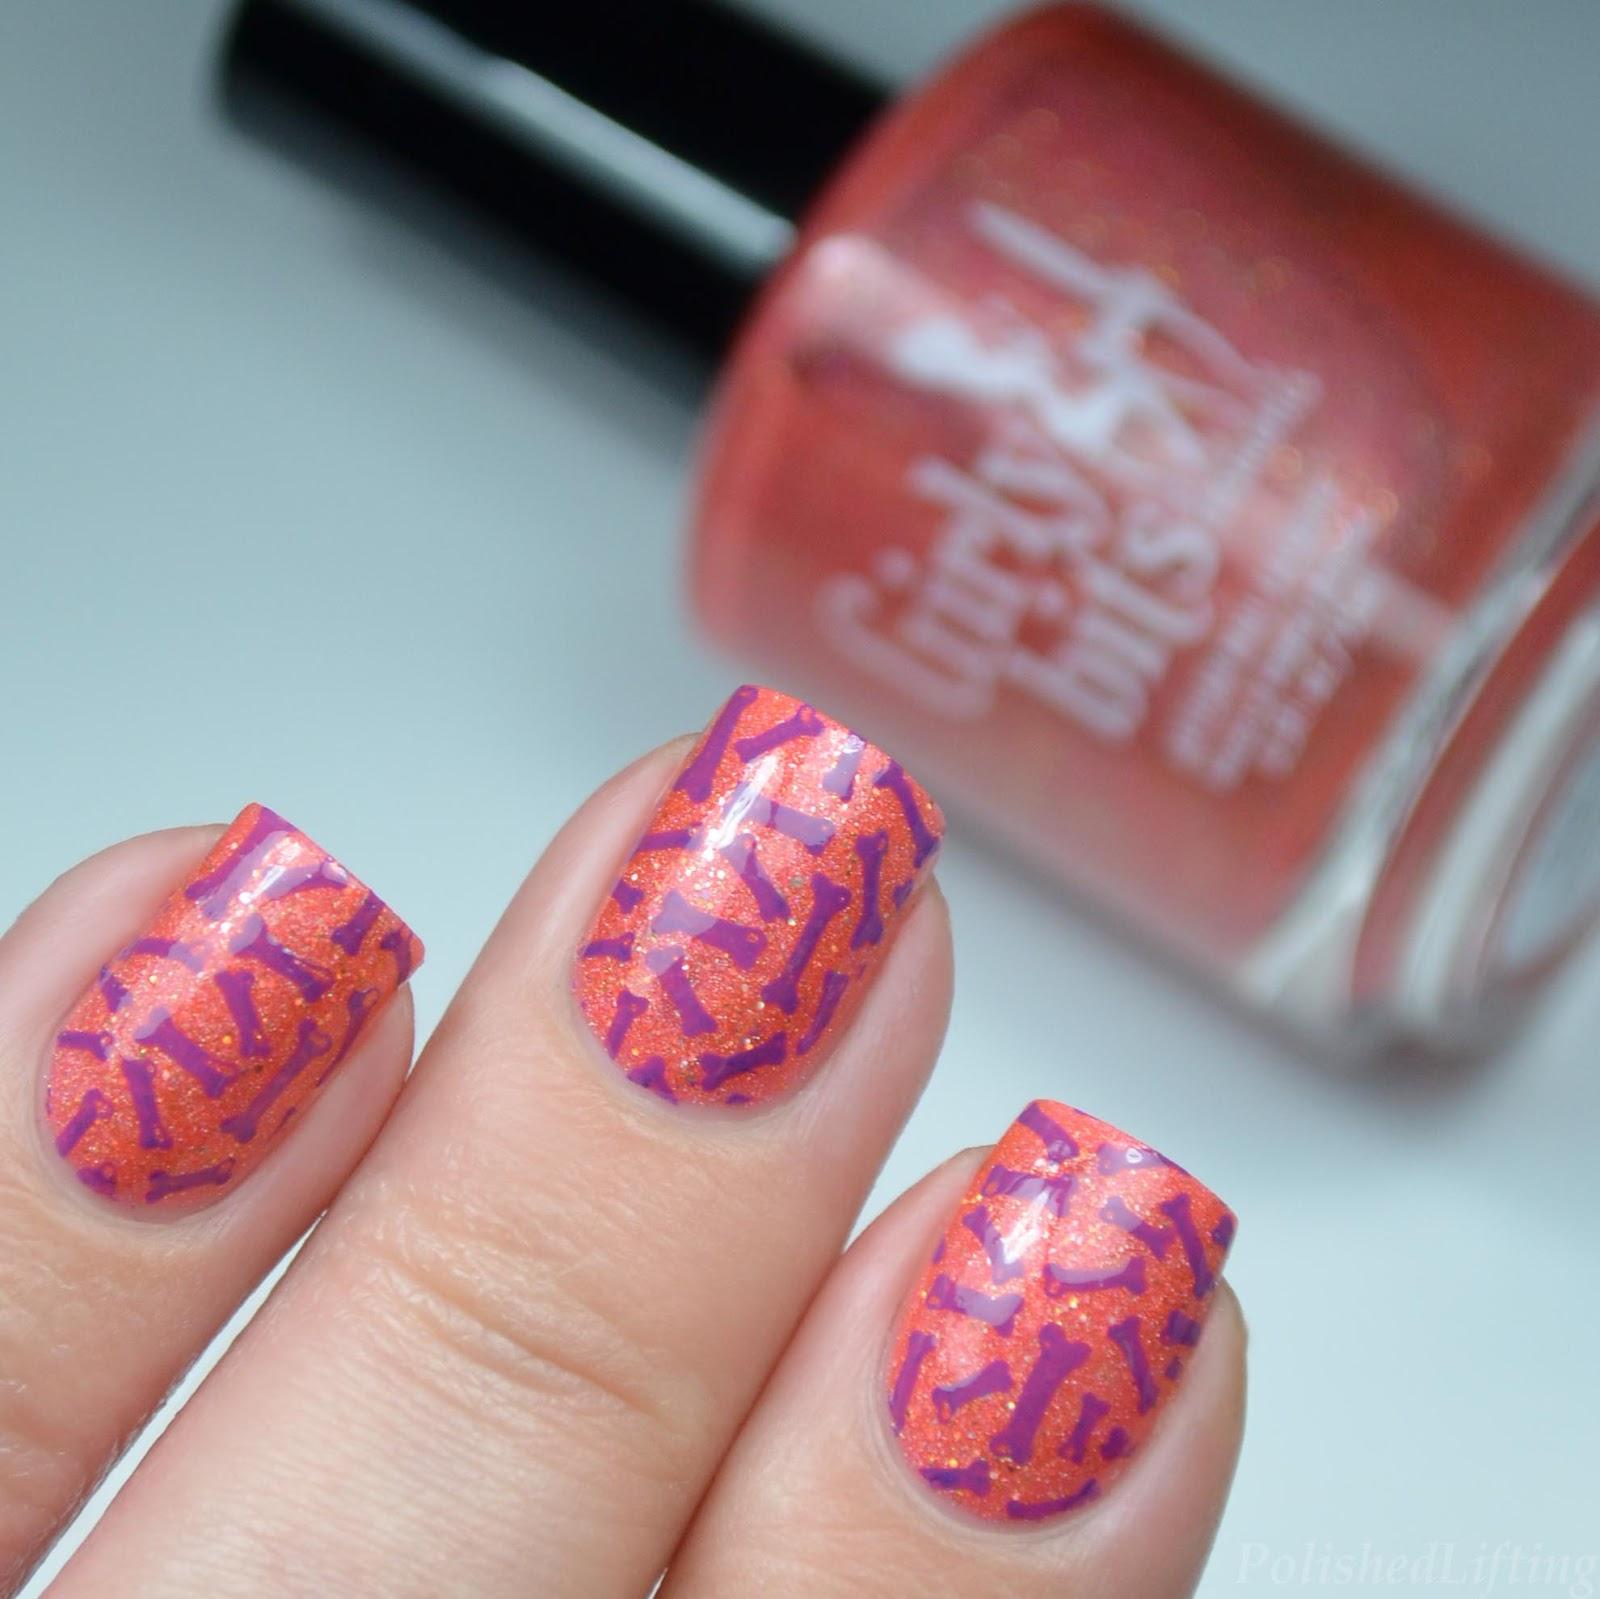 Polished lifting dem bones halloween nail art featuring girly nail art prinsesfo Gallery